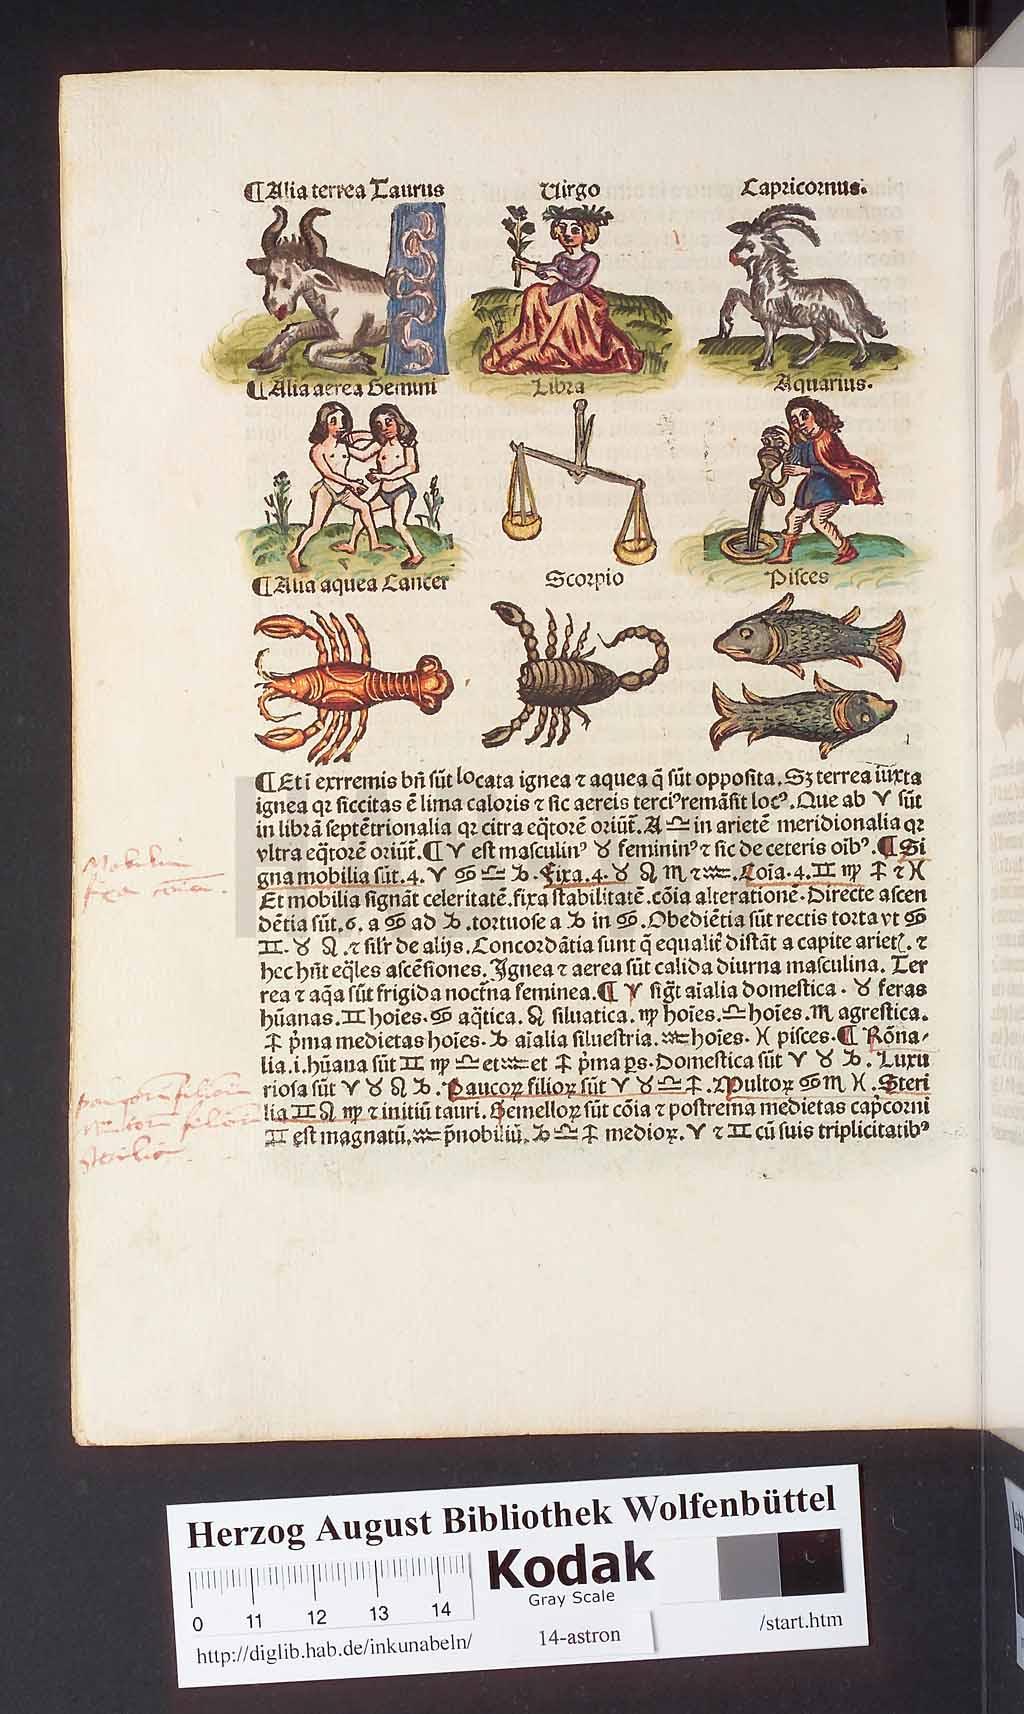 http://diglib.hab.de/inkunabeln/14-astron/00042.jpg